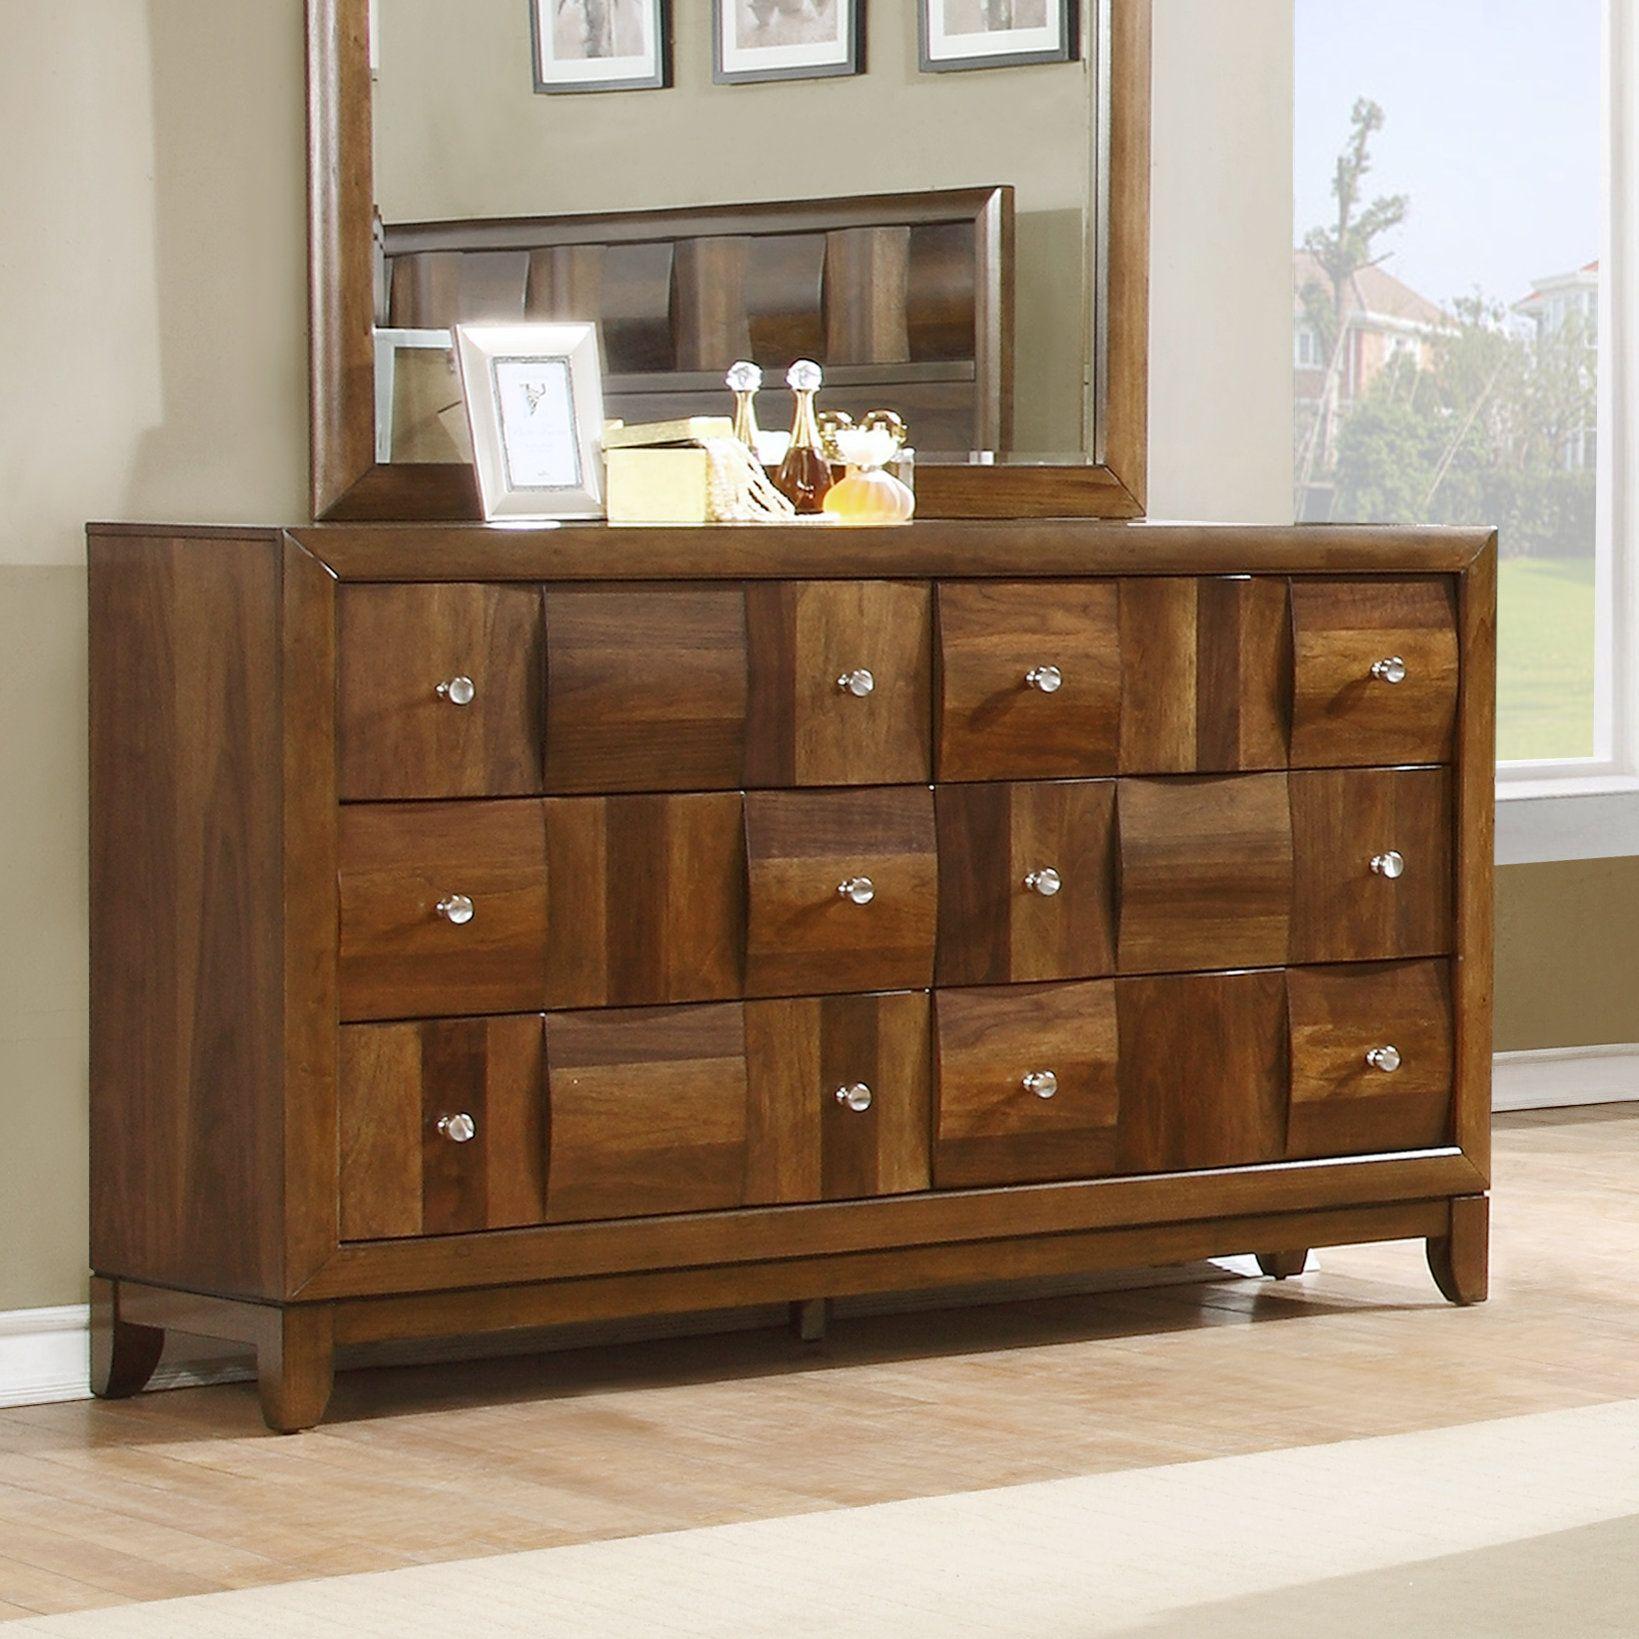 Calais Solid Wood 6 Drawer Dresser Solid Wood Dresser Furniture Home Decor